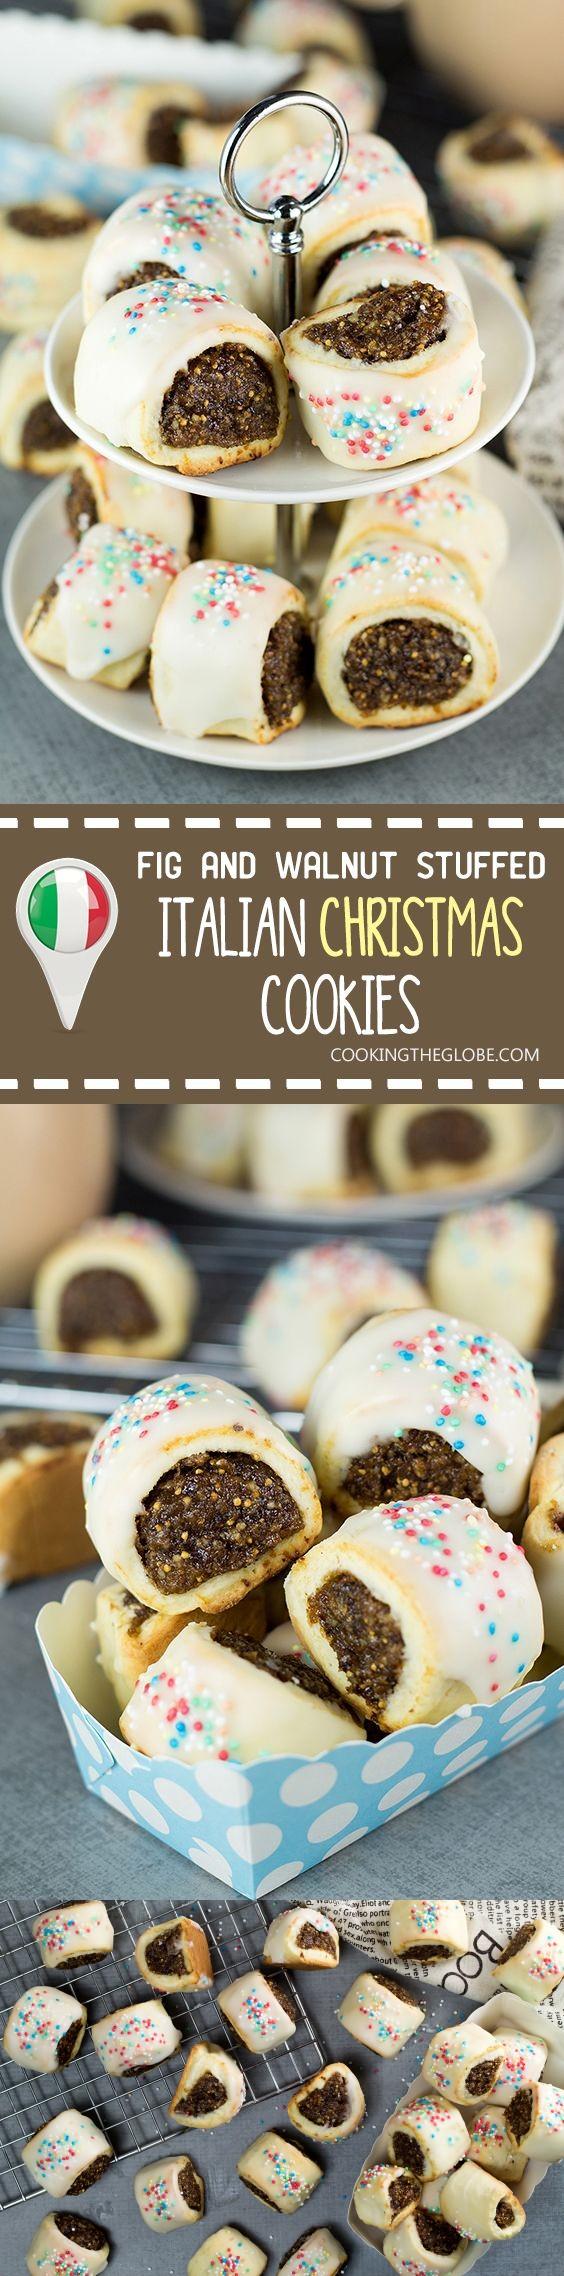 Italian Christmas Cookies with Figs & Walnuts